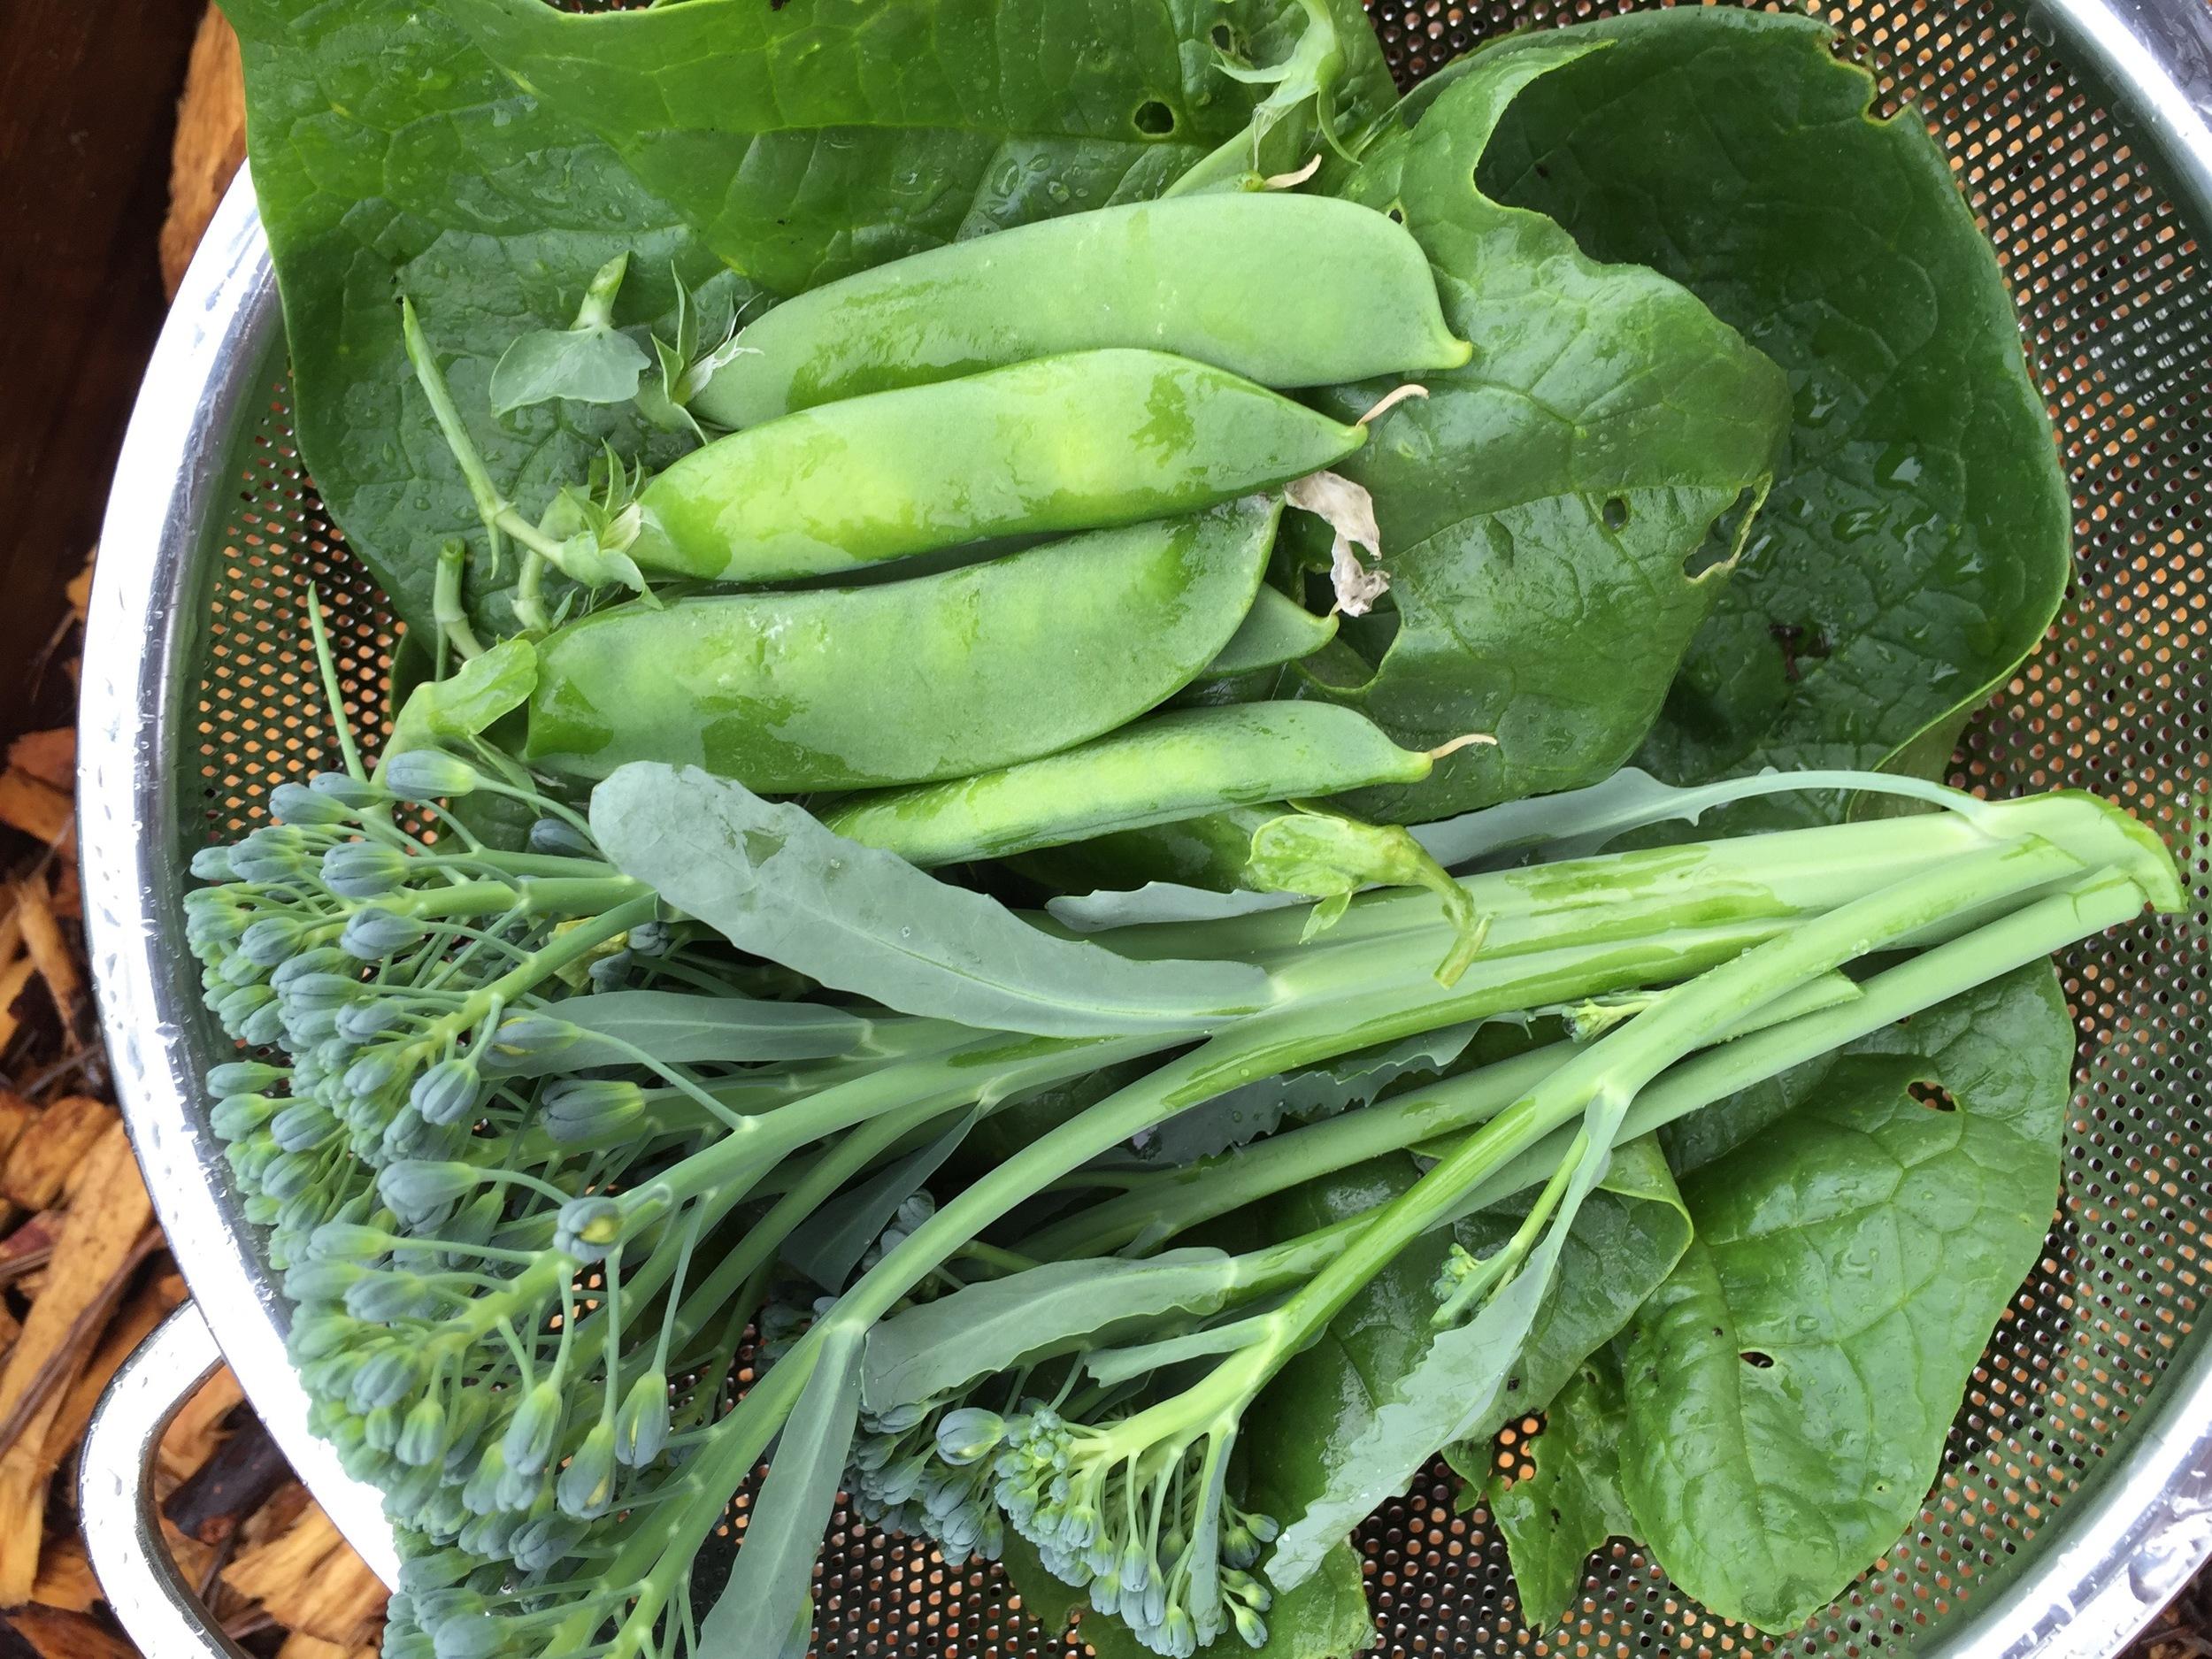 Spinach, Broccoli, Shelling Peas